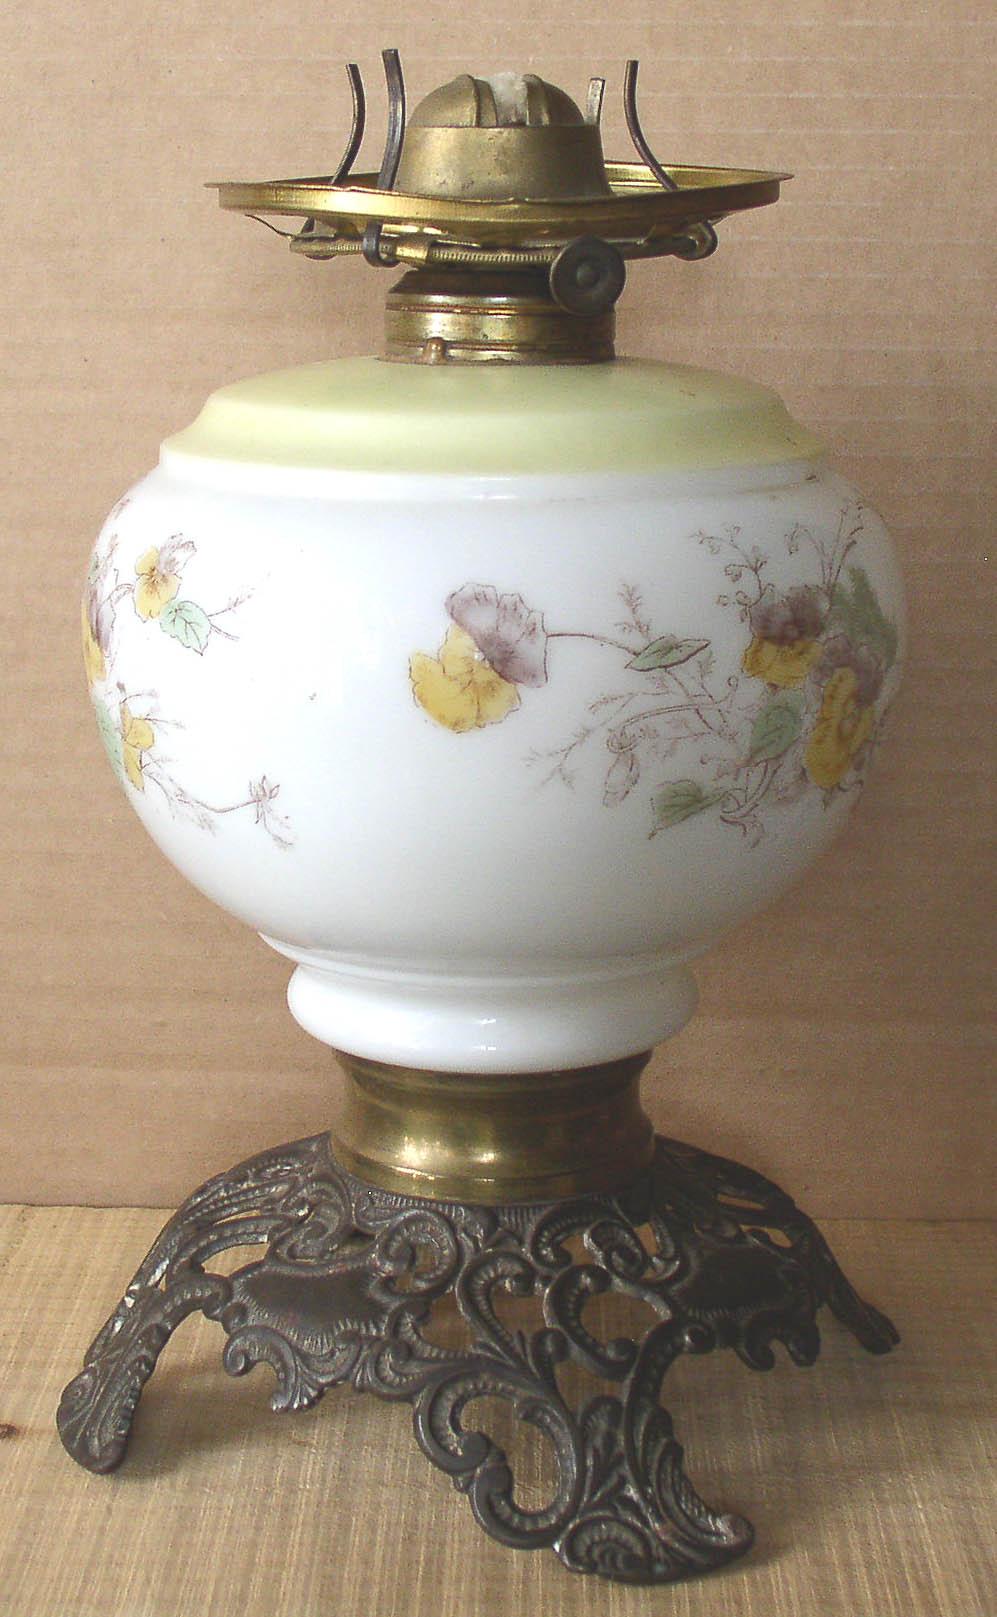 Antique Gwtw Parlour Oil Lamp Base Thingery Previews